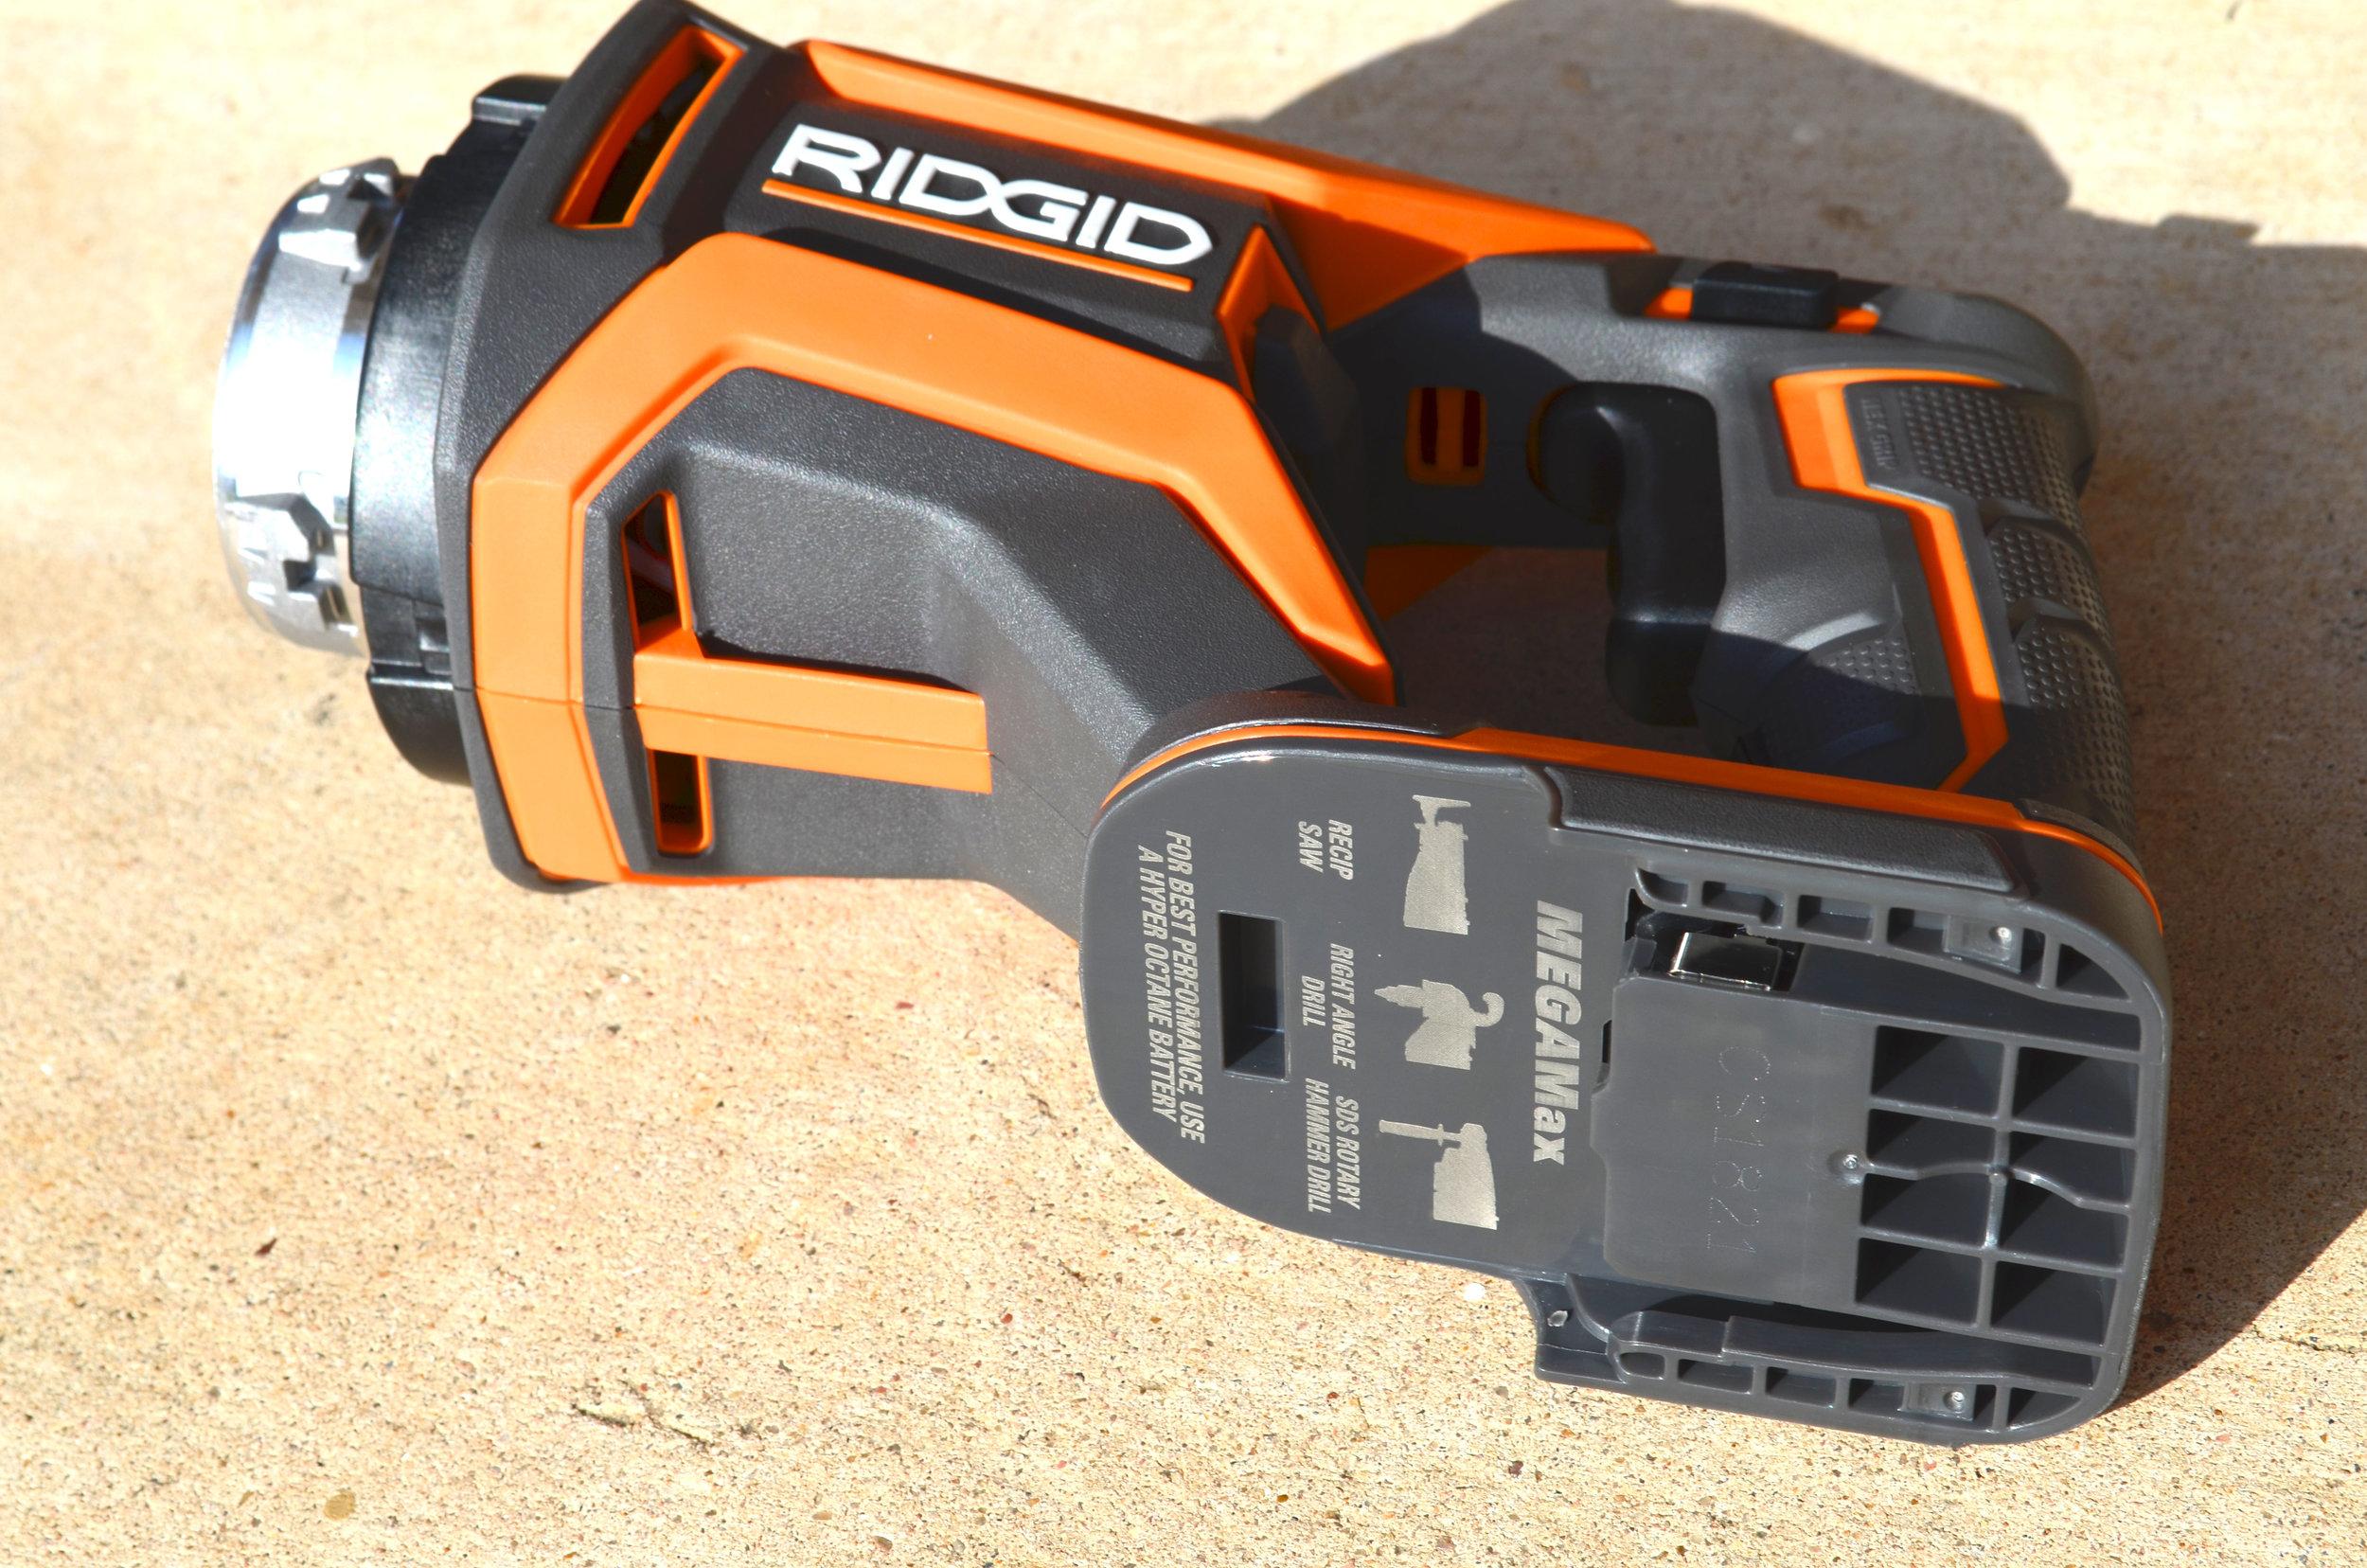 ridgid-mighty-max-receiver.jpg